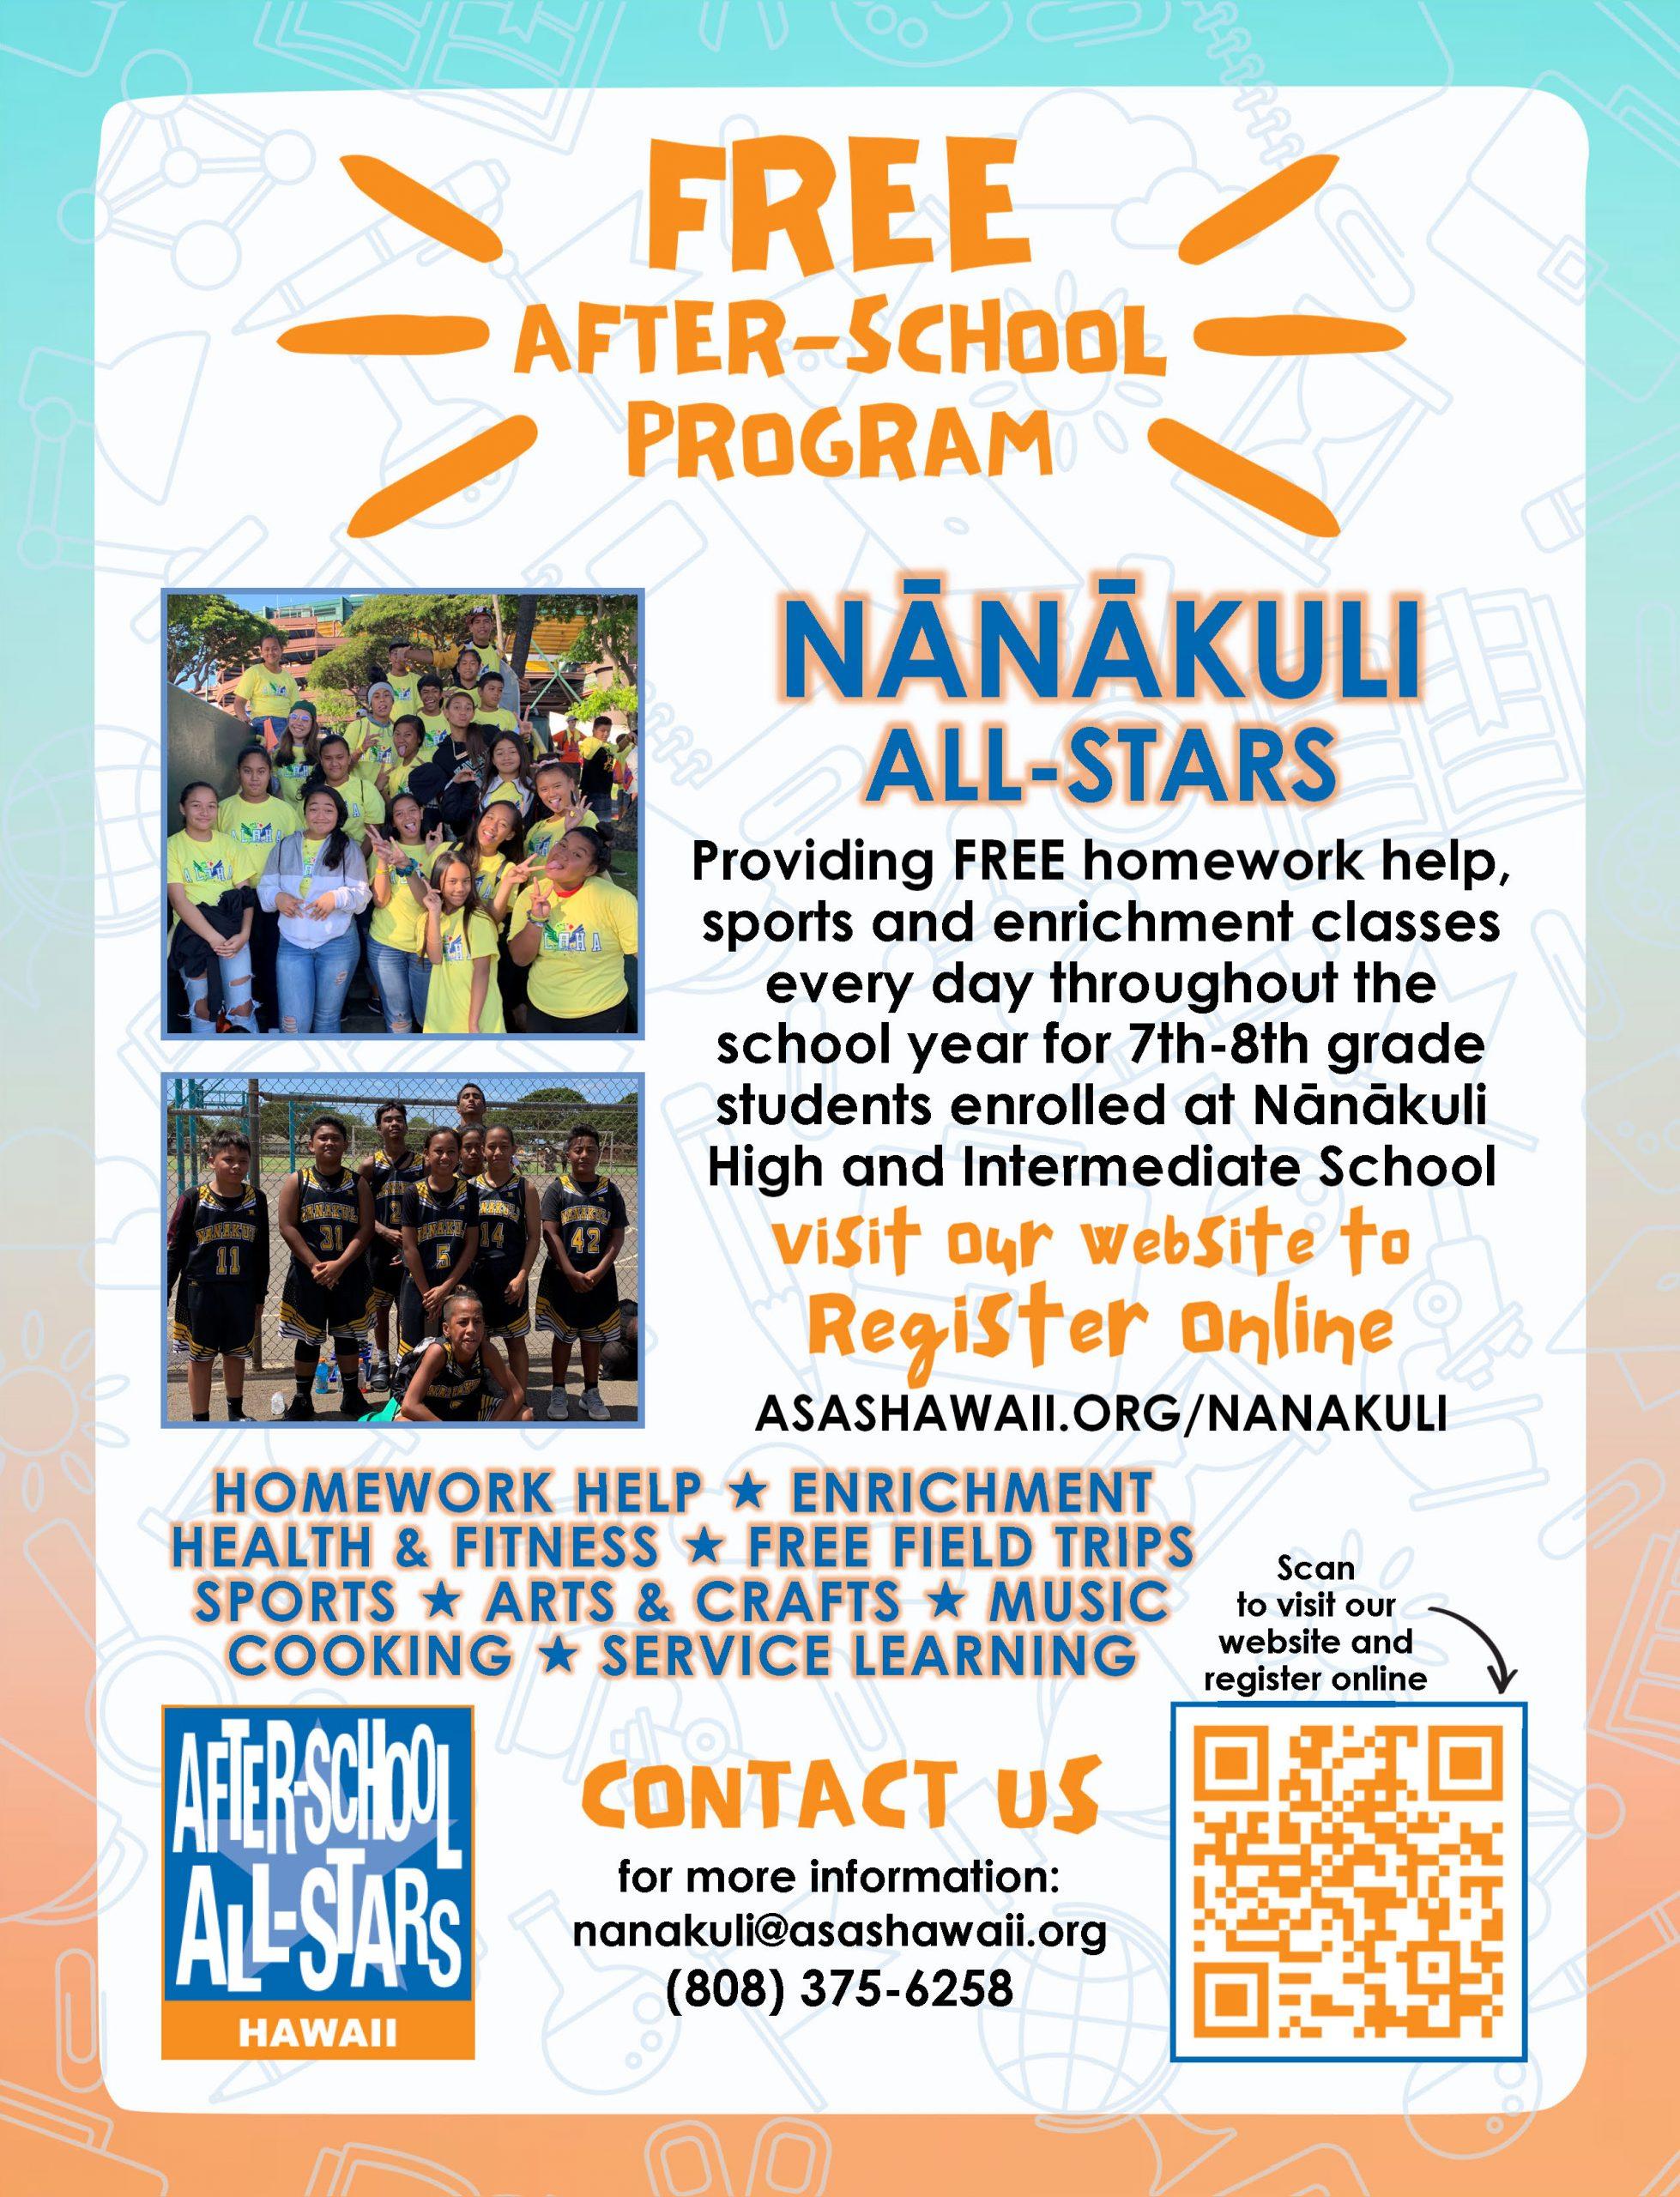 Nanakuli All-Stars